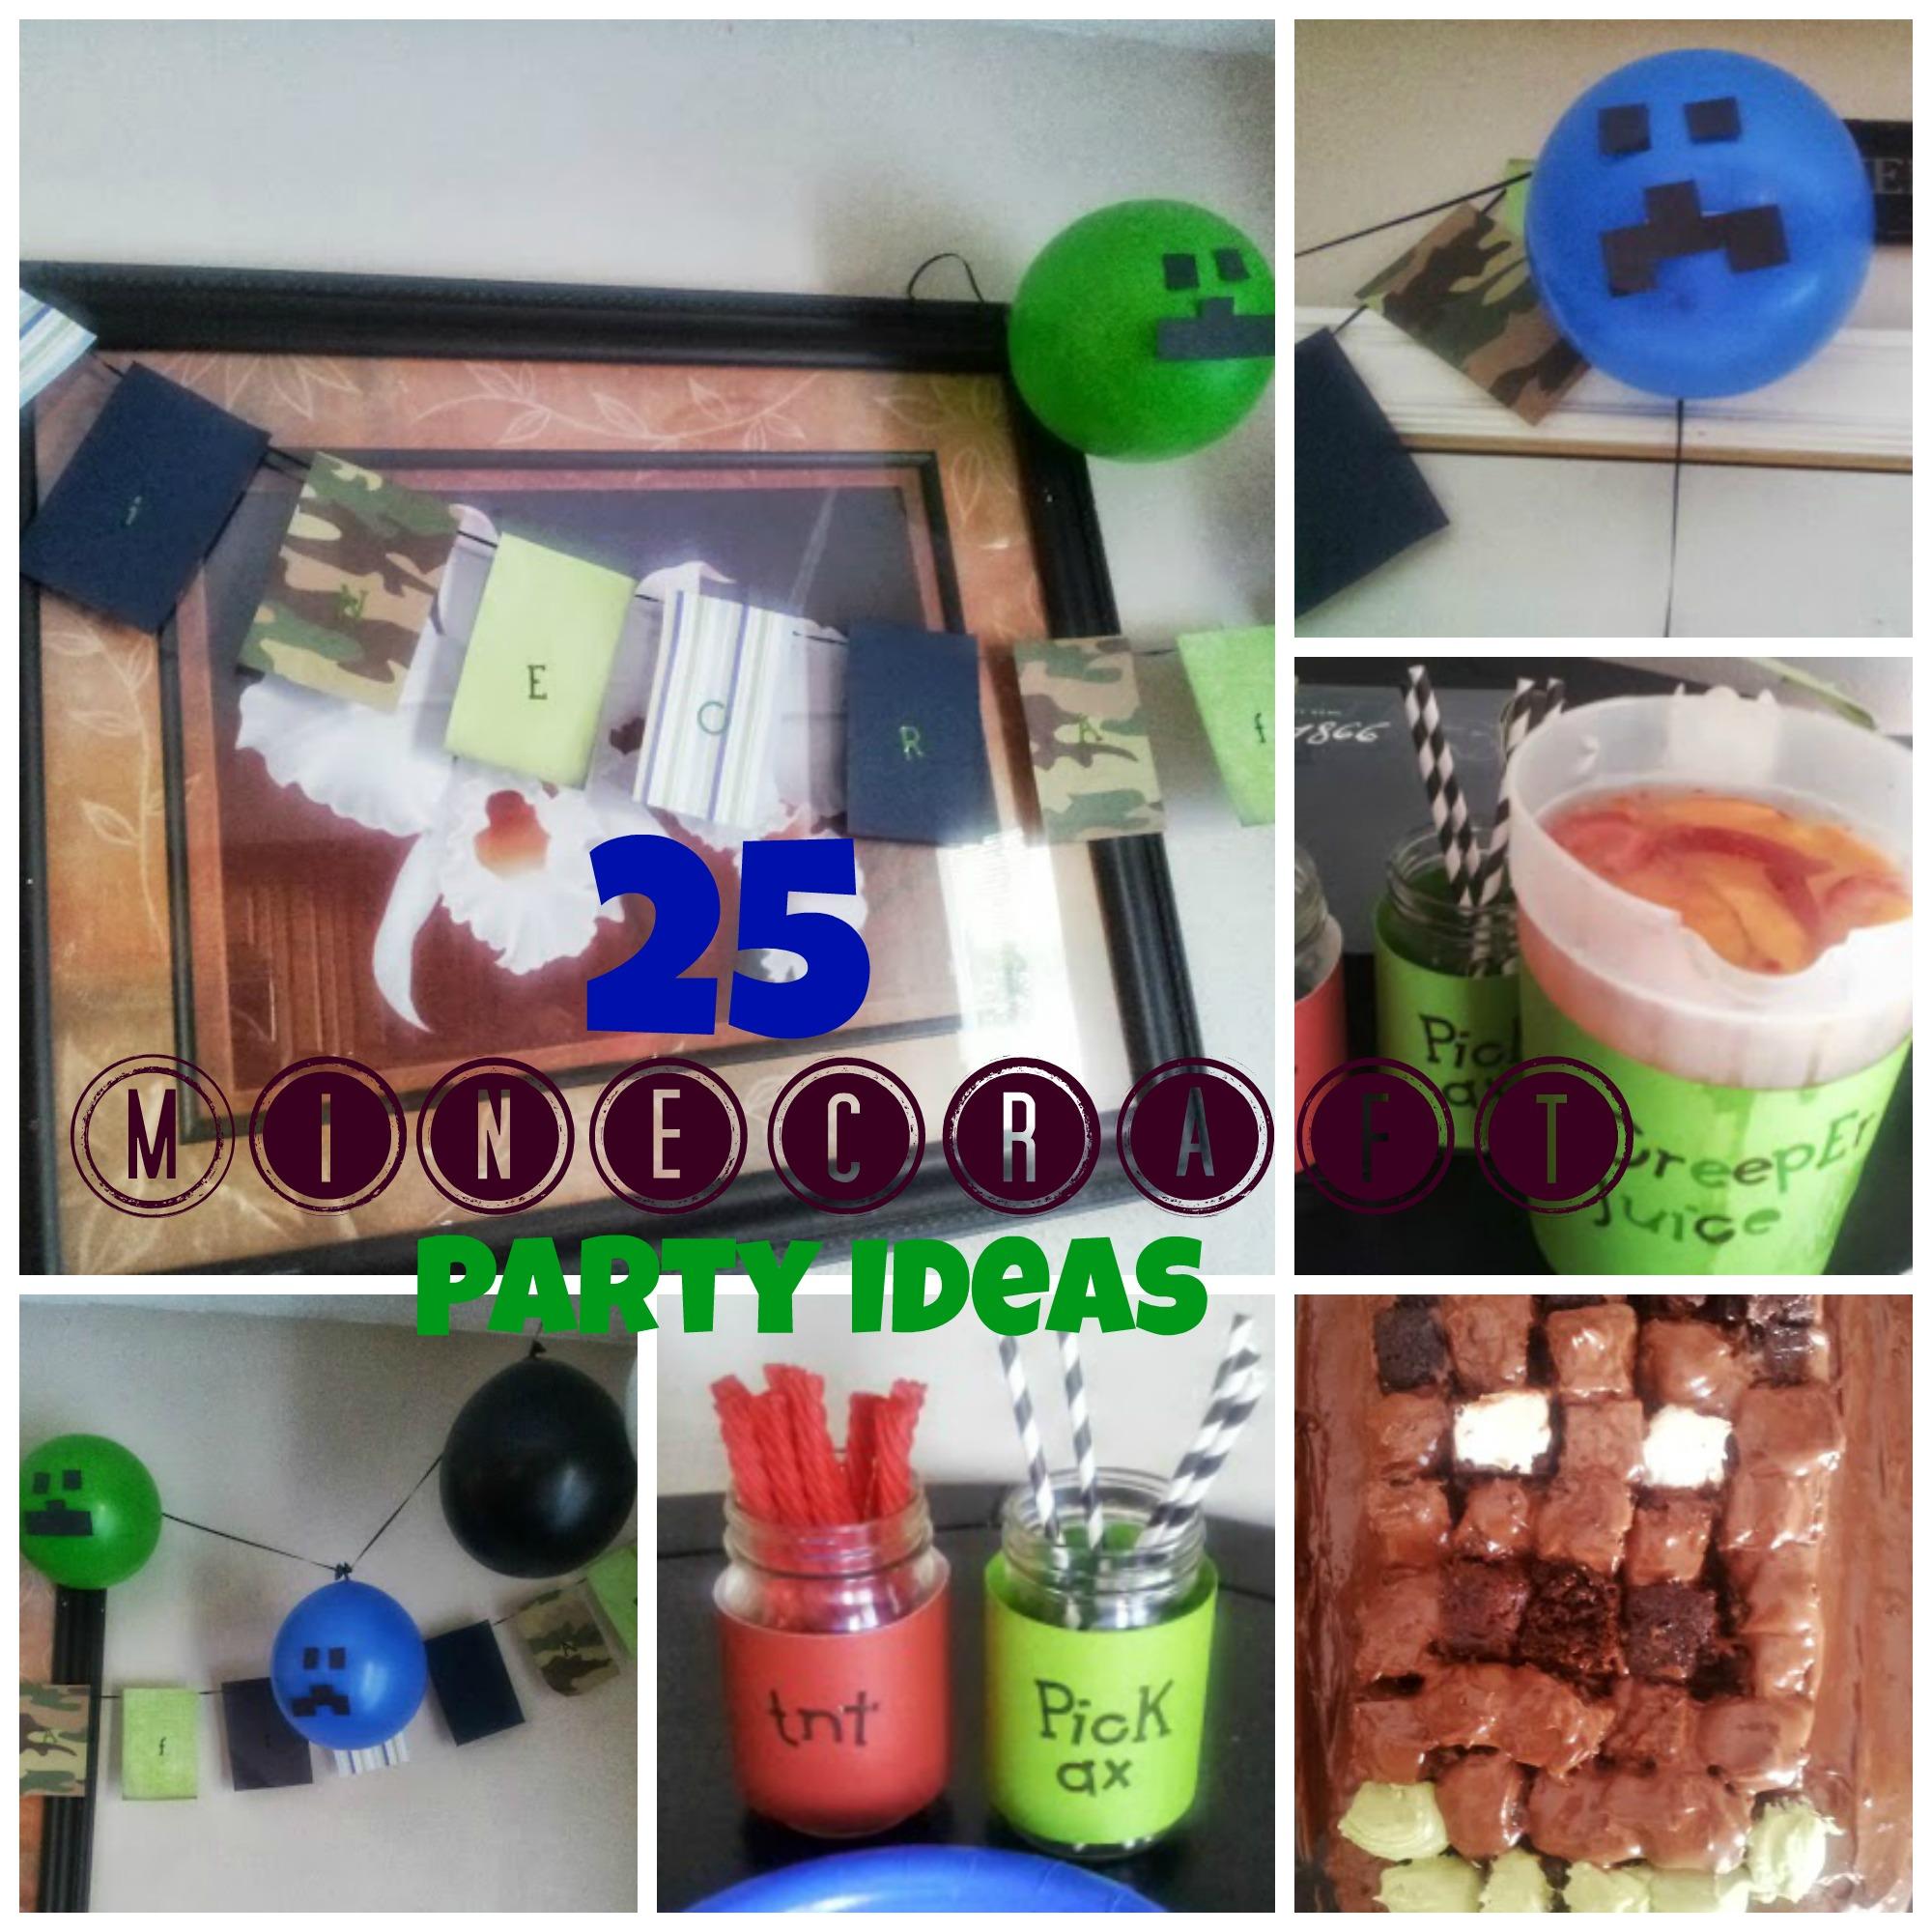 Mine craft birthday ideas - 25 Minecraft Birthday Party Ideas